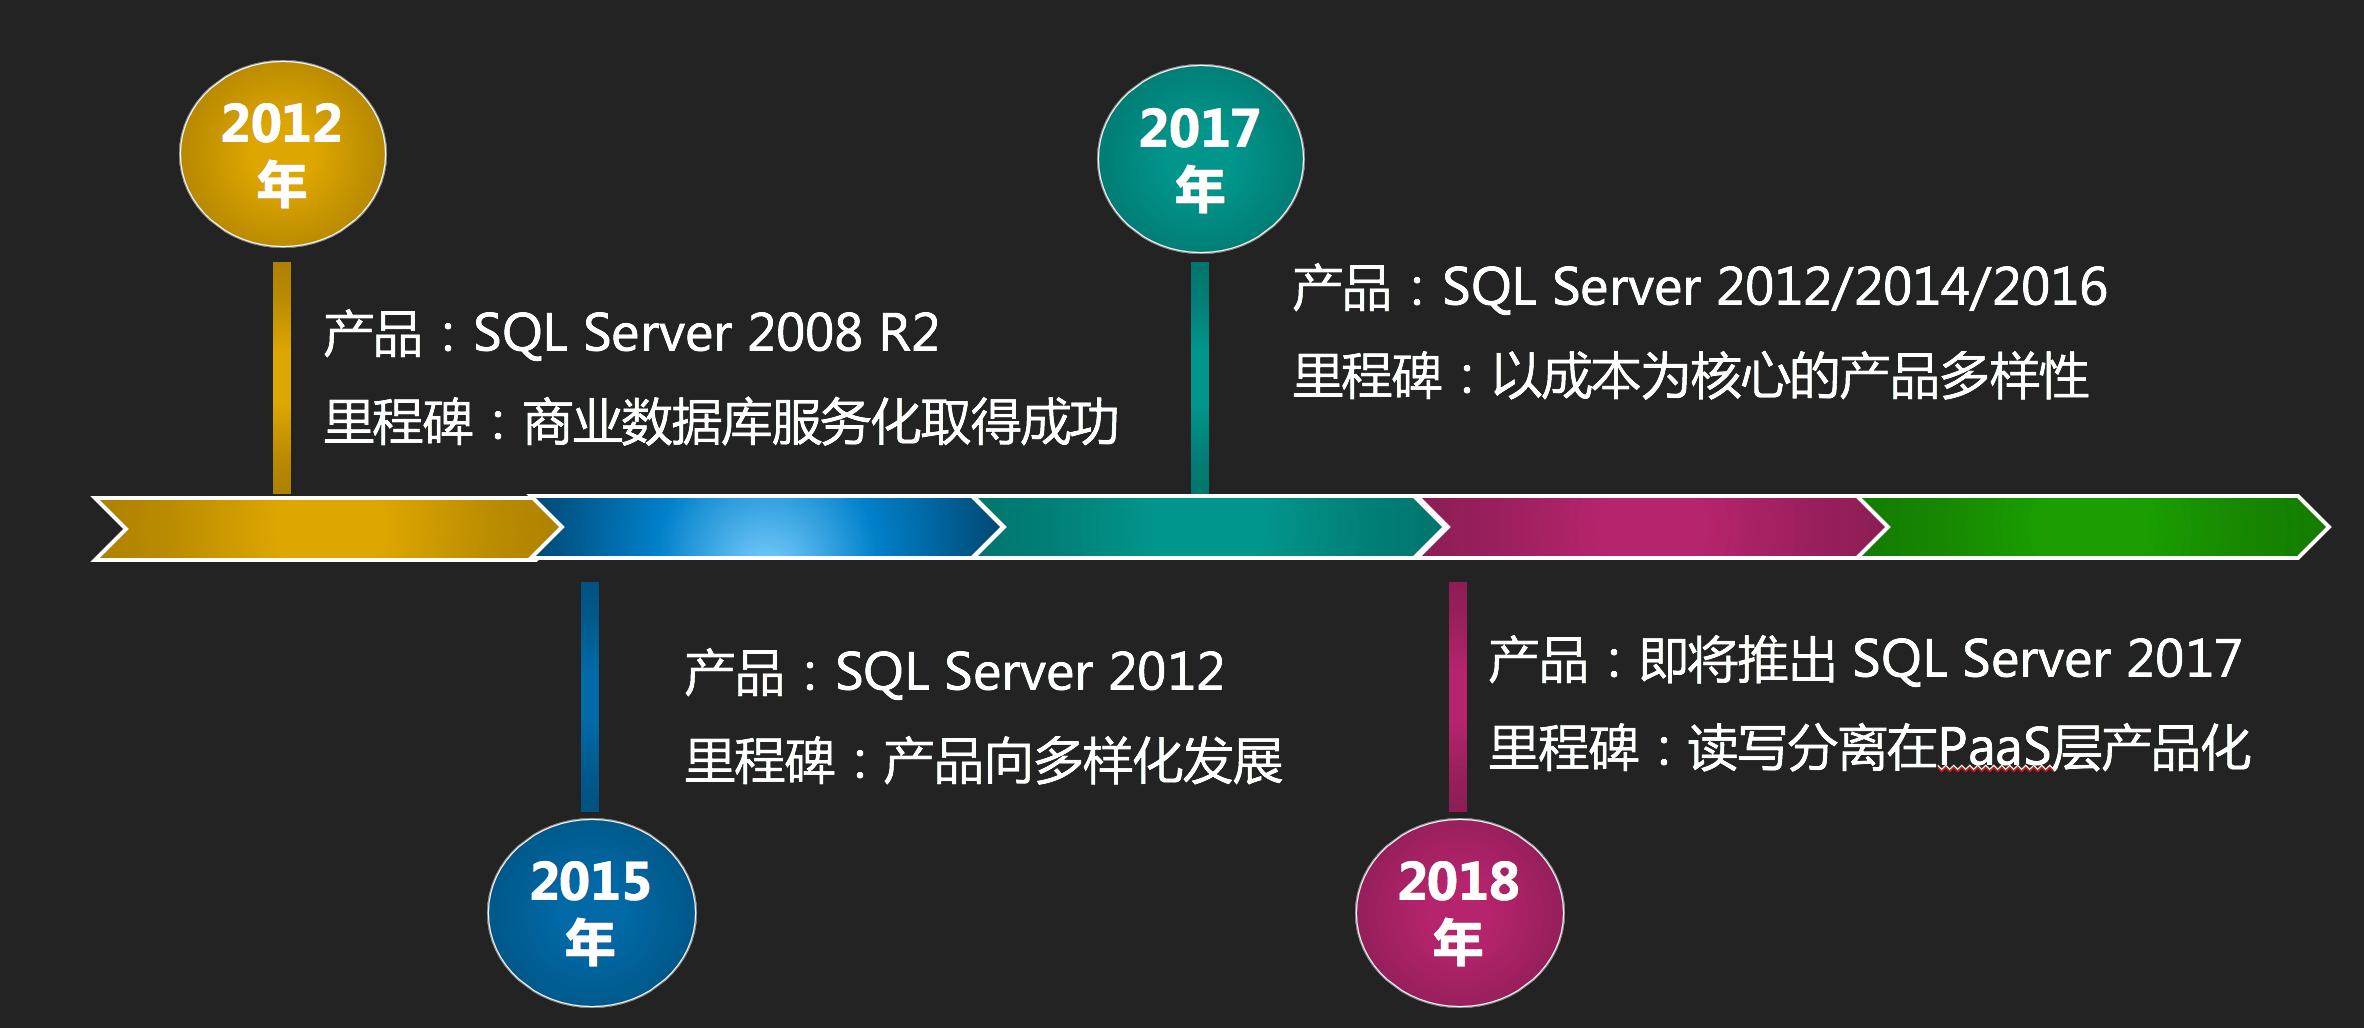 阿里云SQLServer发展历程 .png